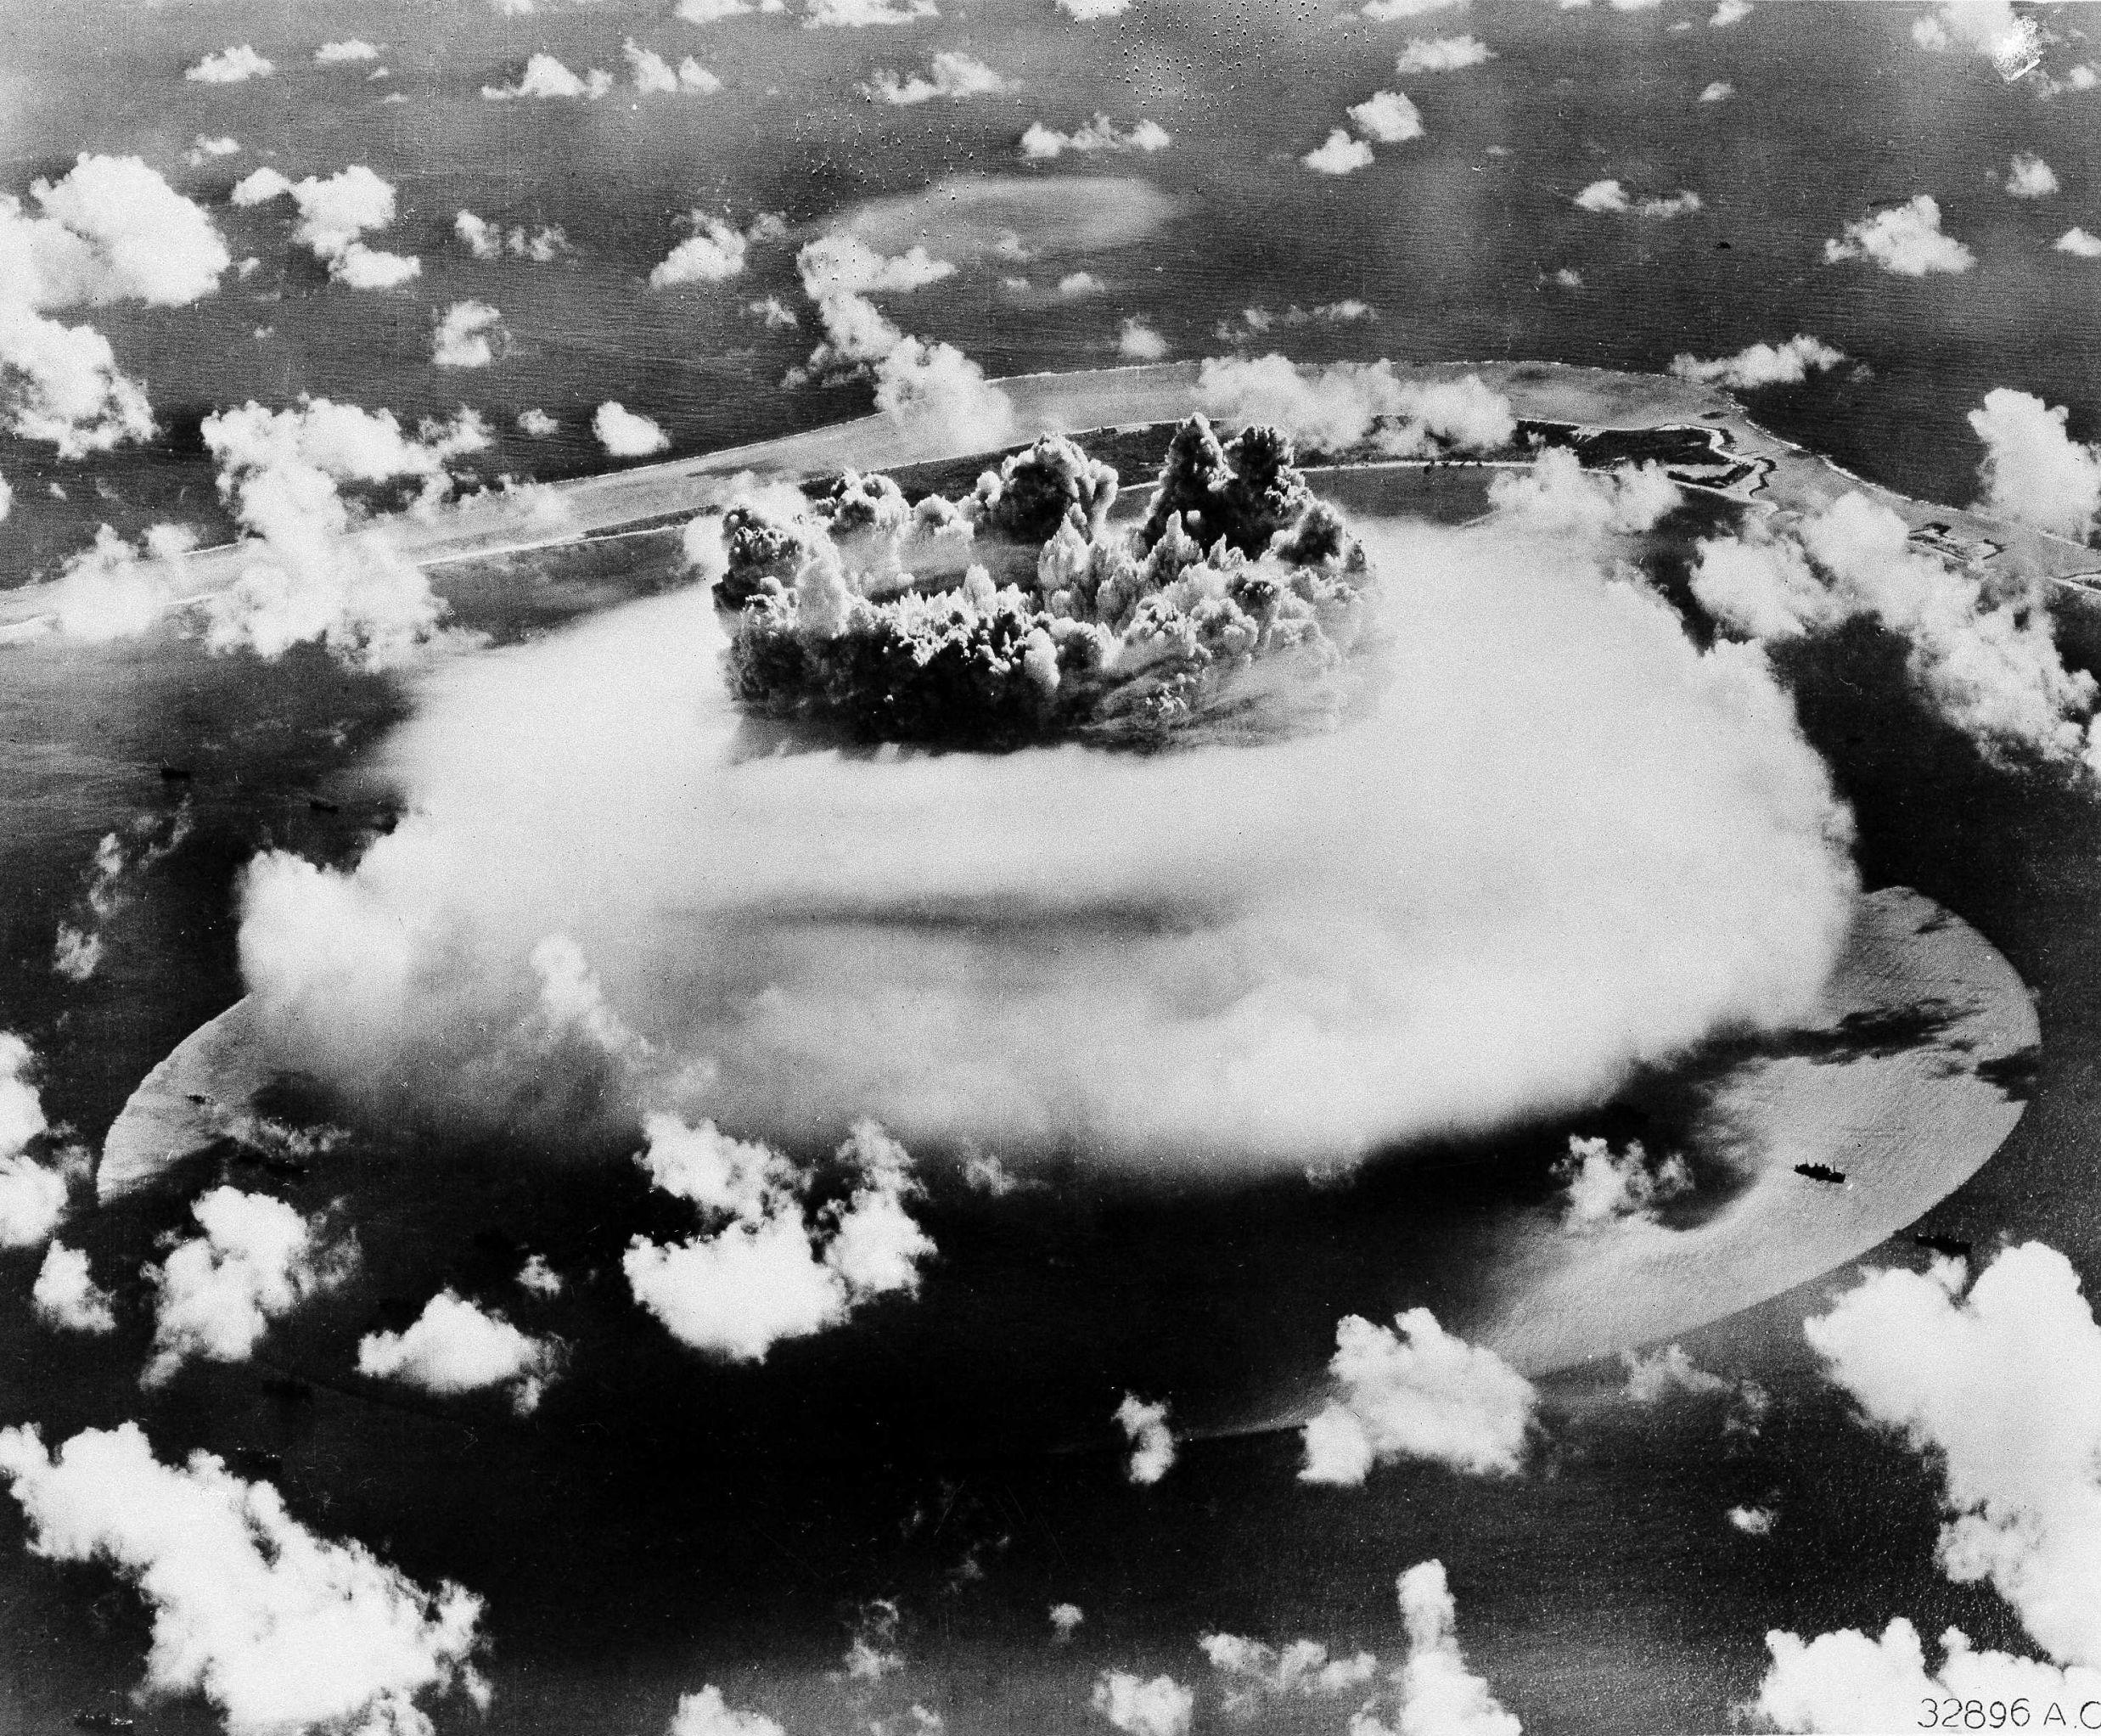 Testes nucleares no atol de Bikini